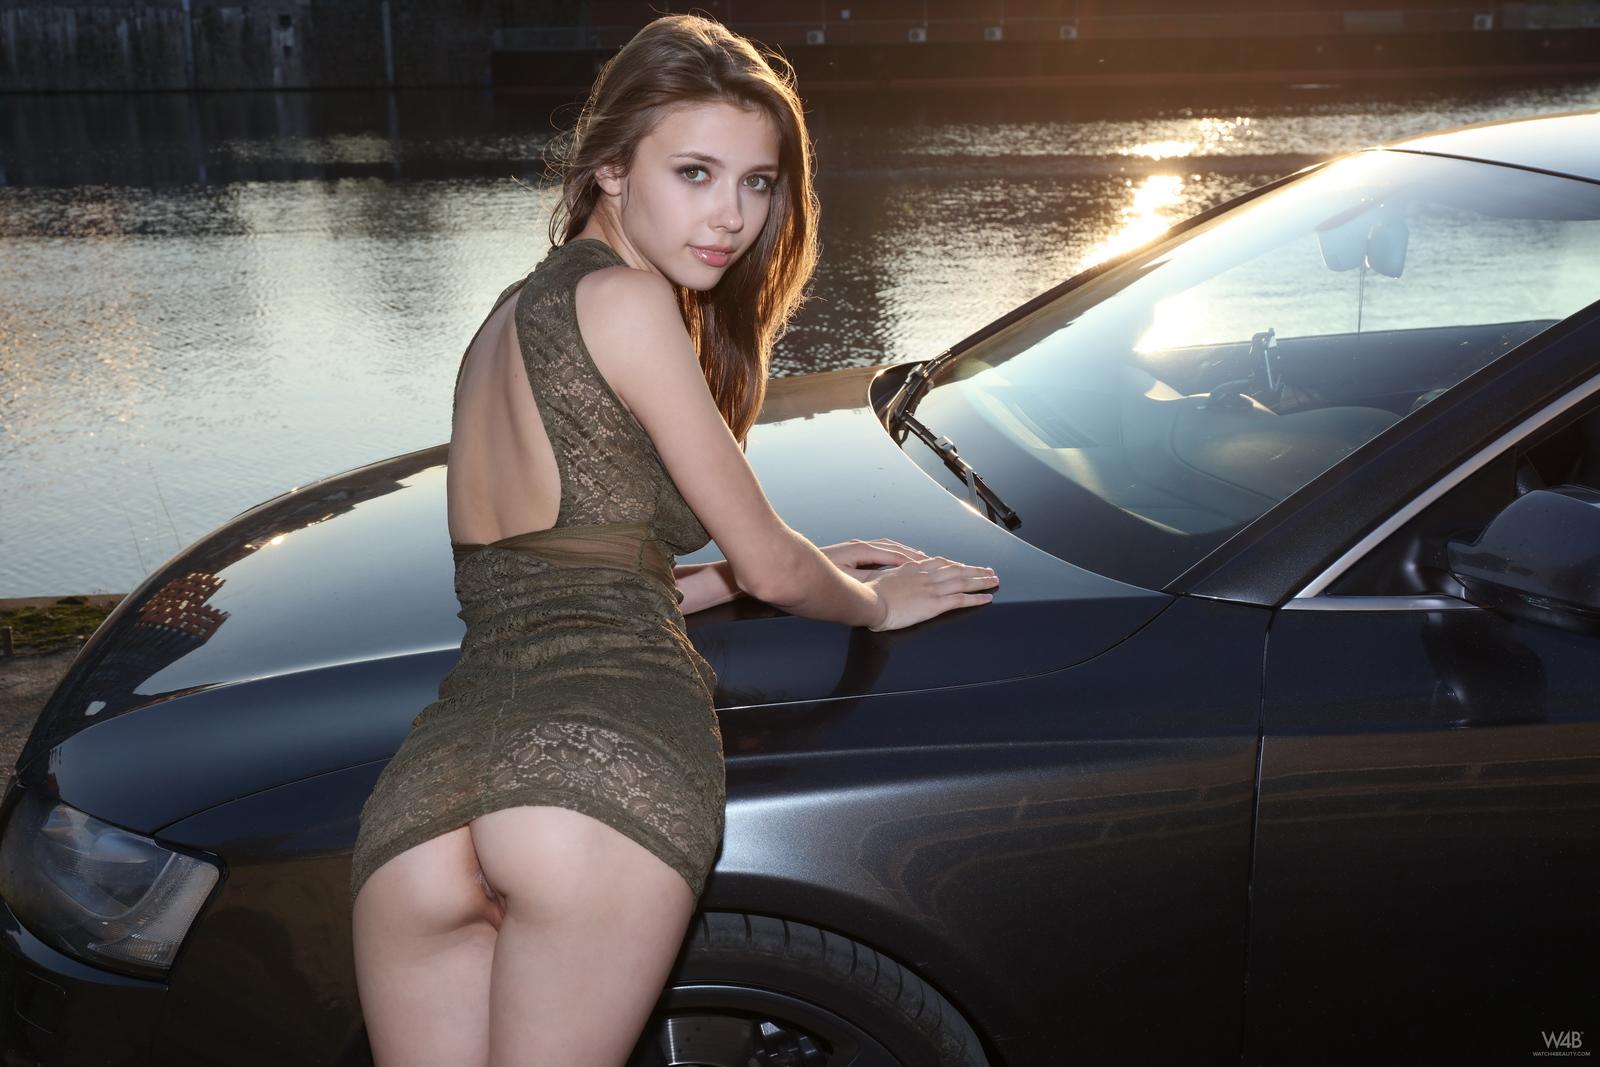 https://redbust.com/stuff/mila-azul-audi-rs5/milla-nude-audi-rs5-cars-pussy-watch4beauty-11.jpg